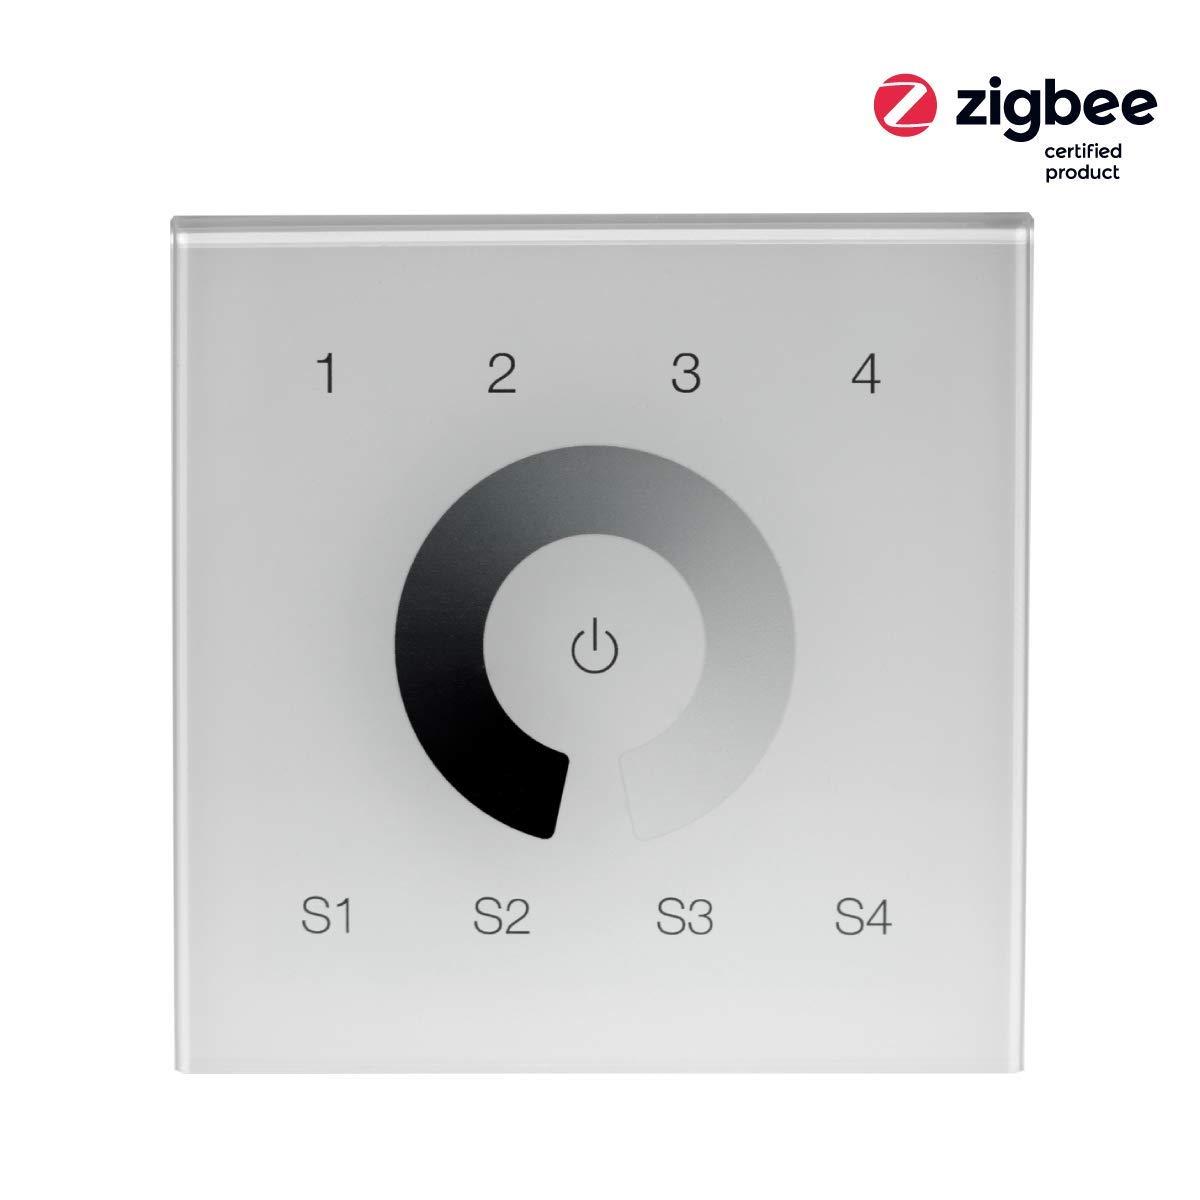 iluminize Zigbee 3.0 Variateur mural Touch 230.00V